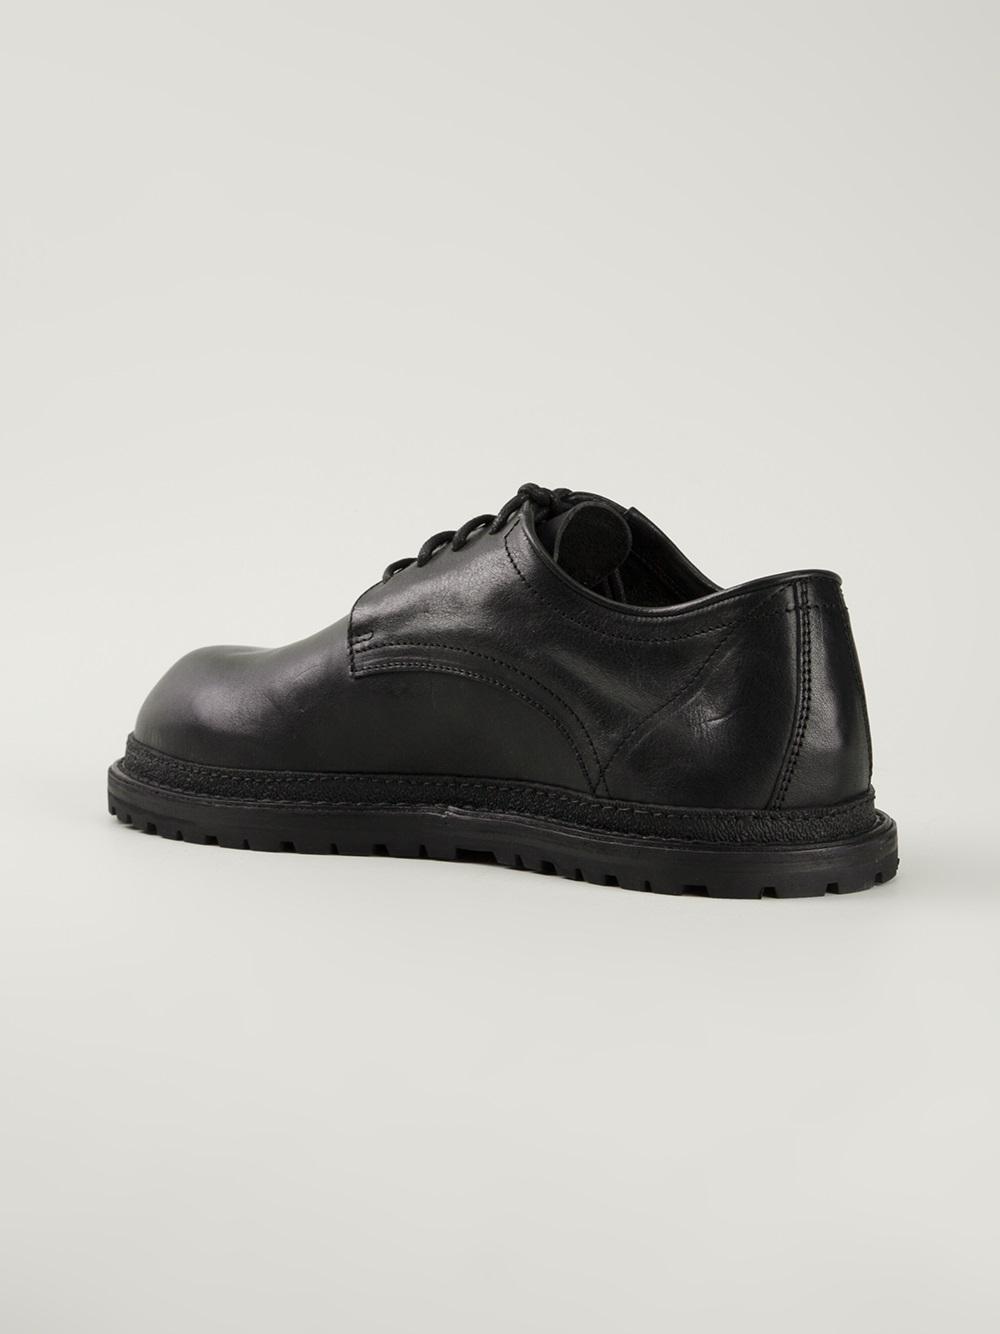 Ann Demeulemeester Black Leather Derbys erK6kUBEy